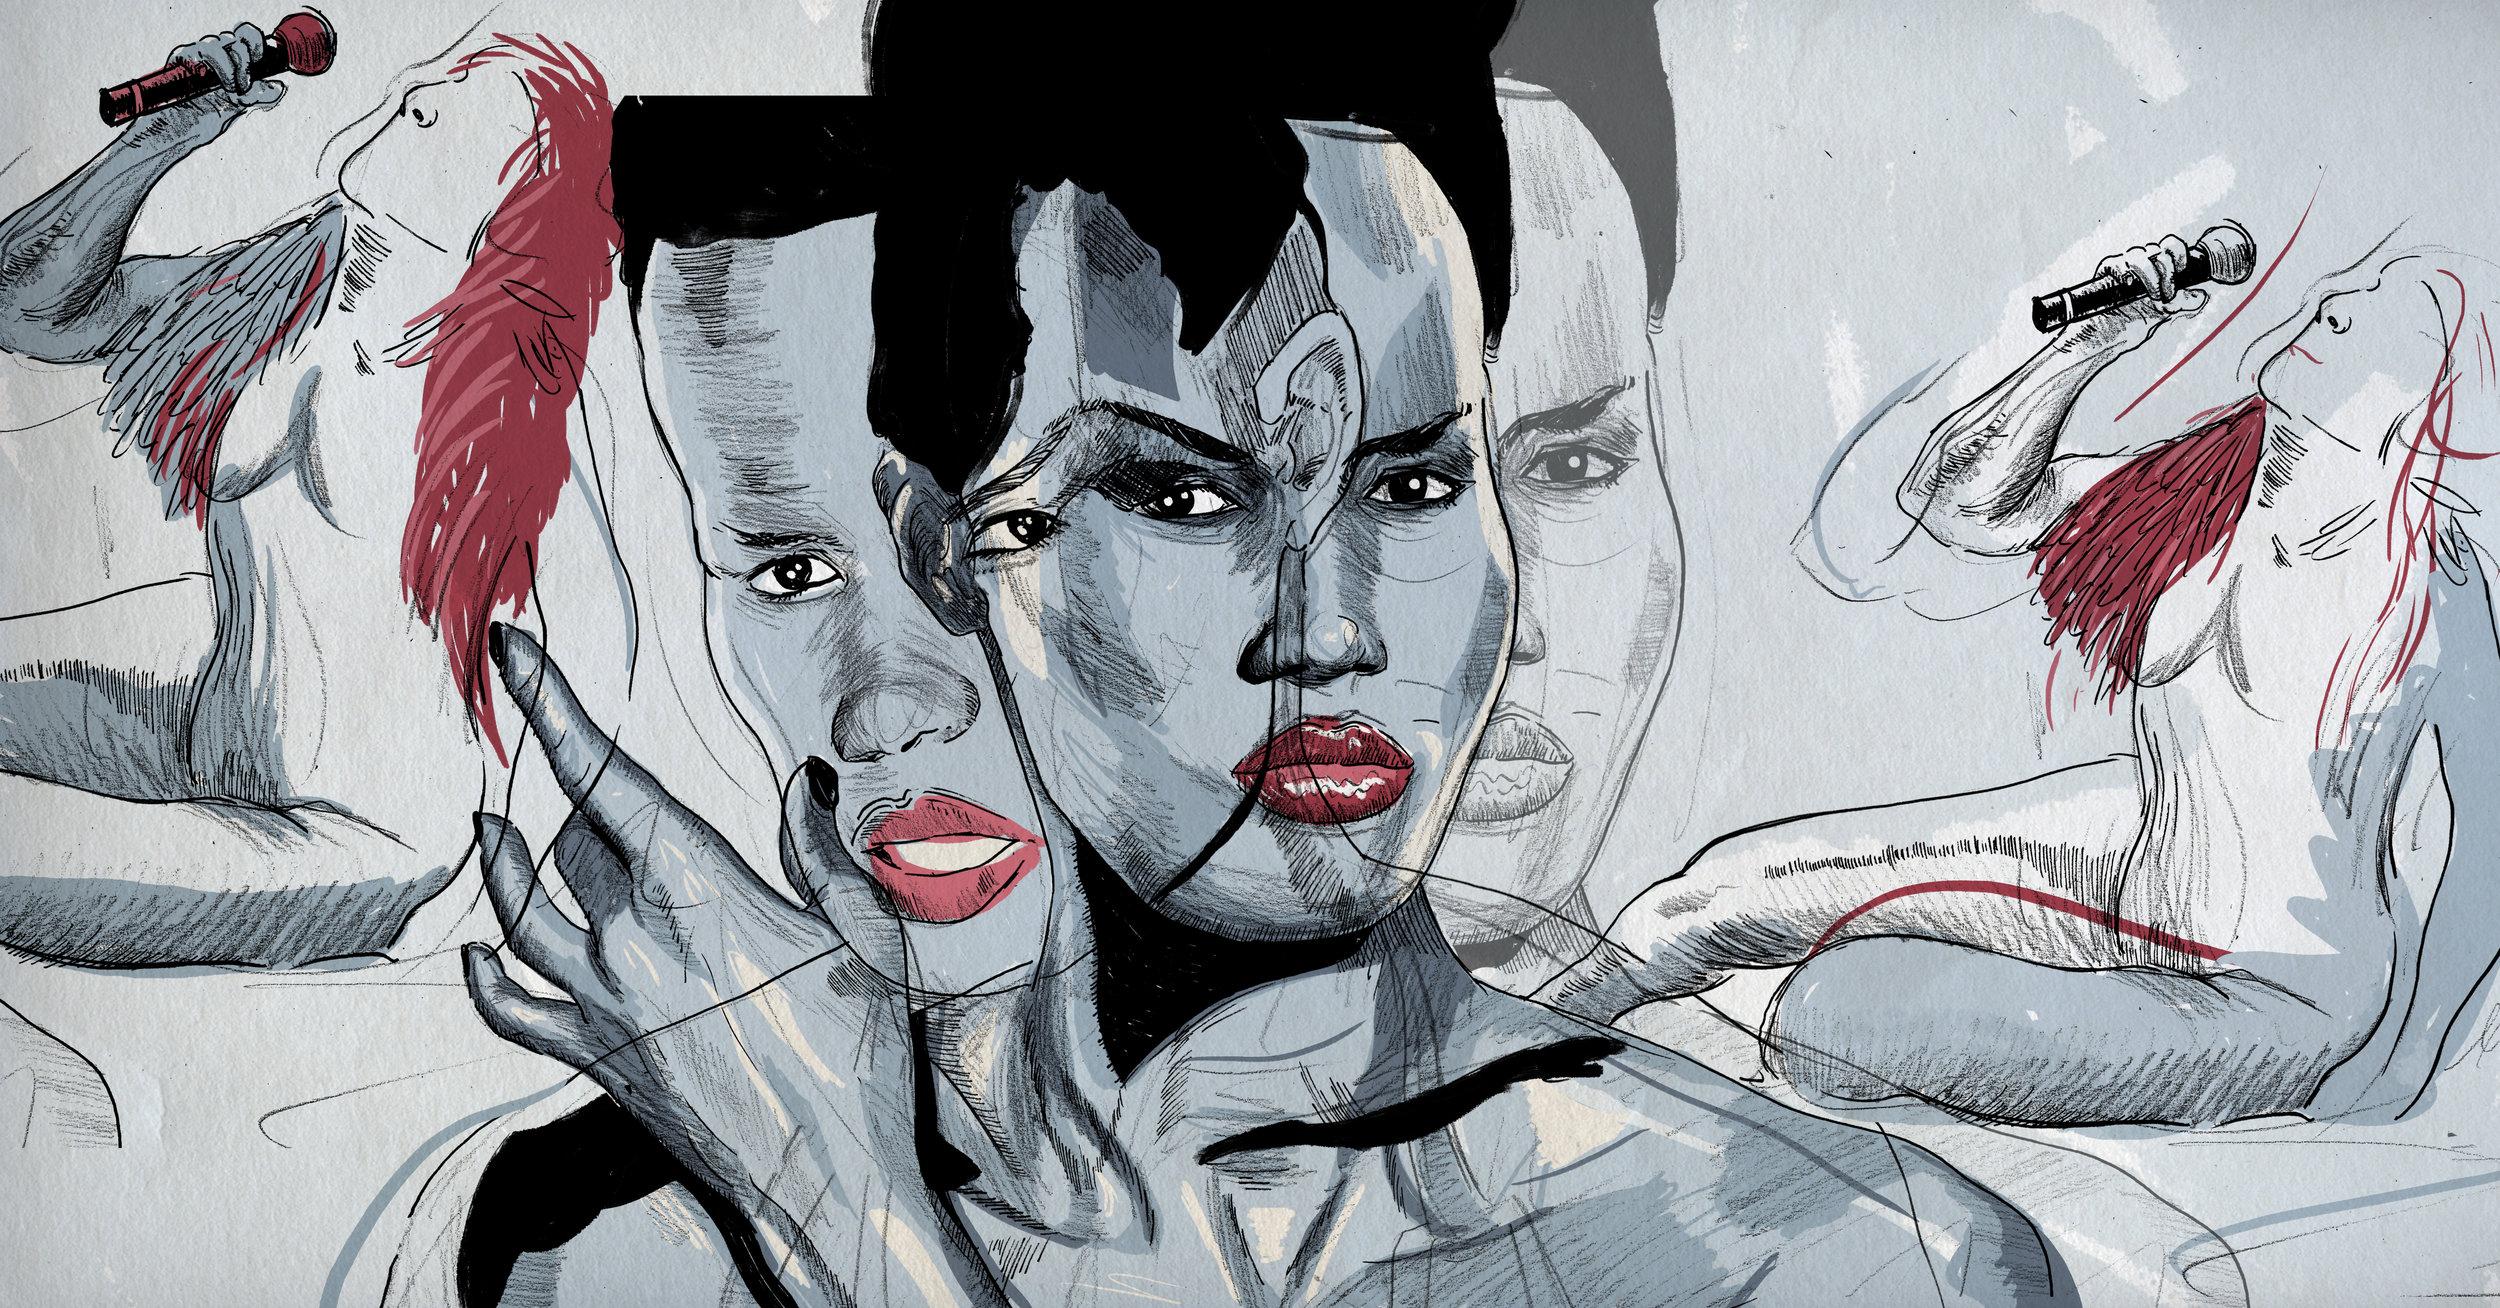 Grace Jones and the Power of Sex by Daisy Jones